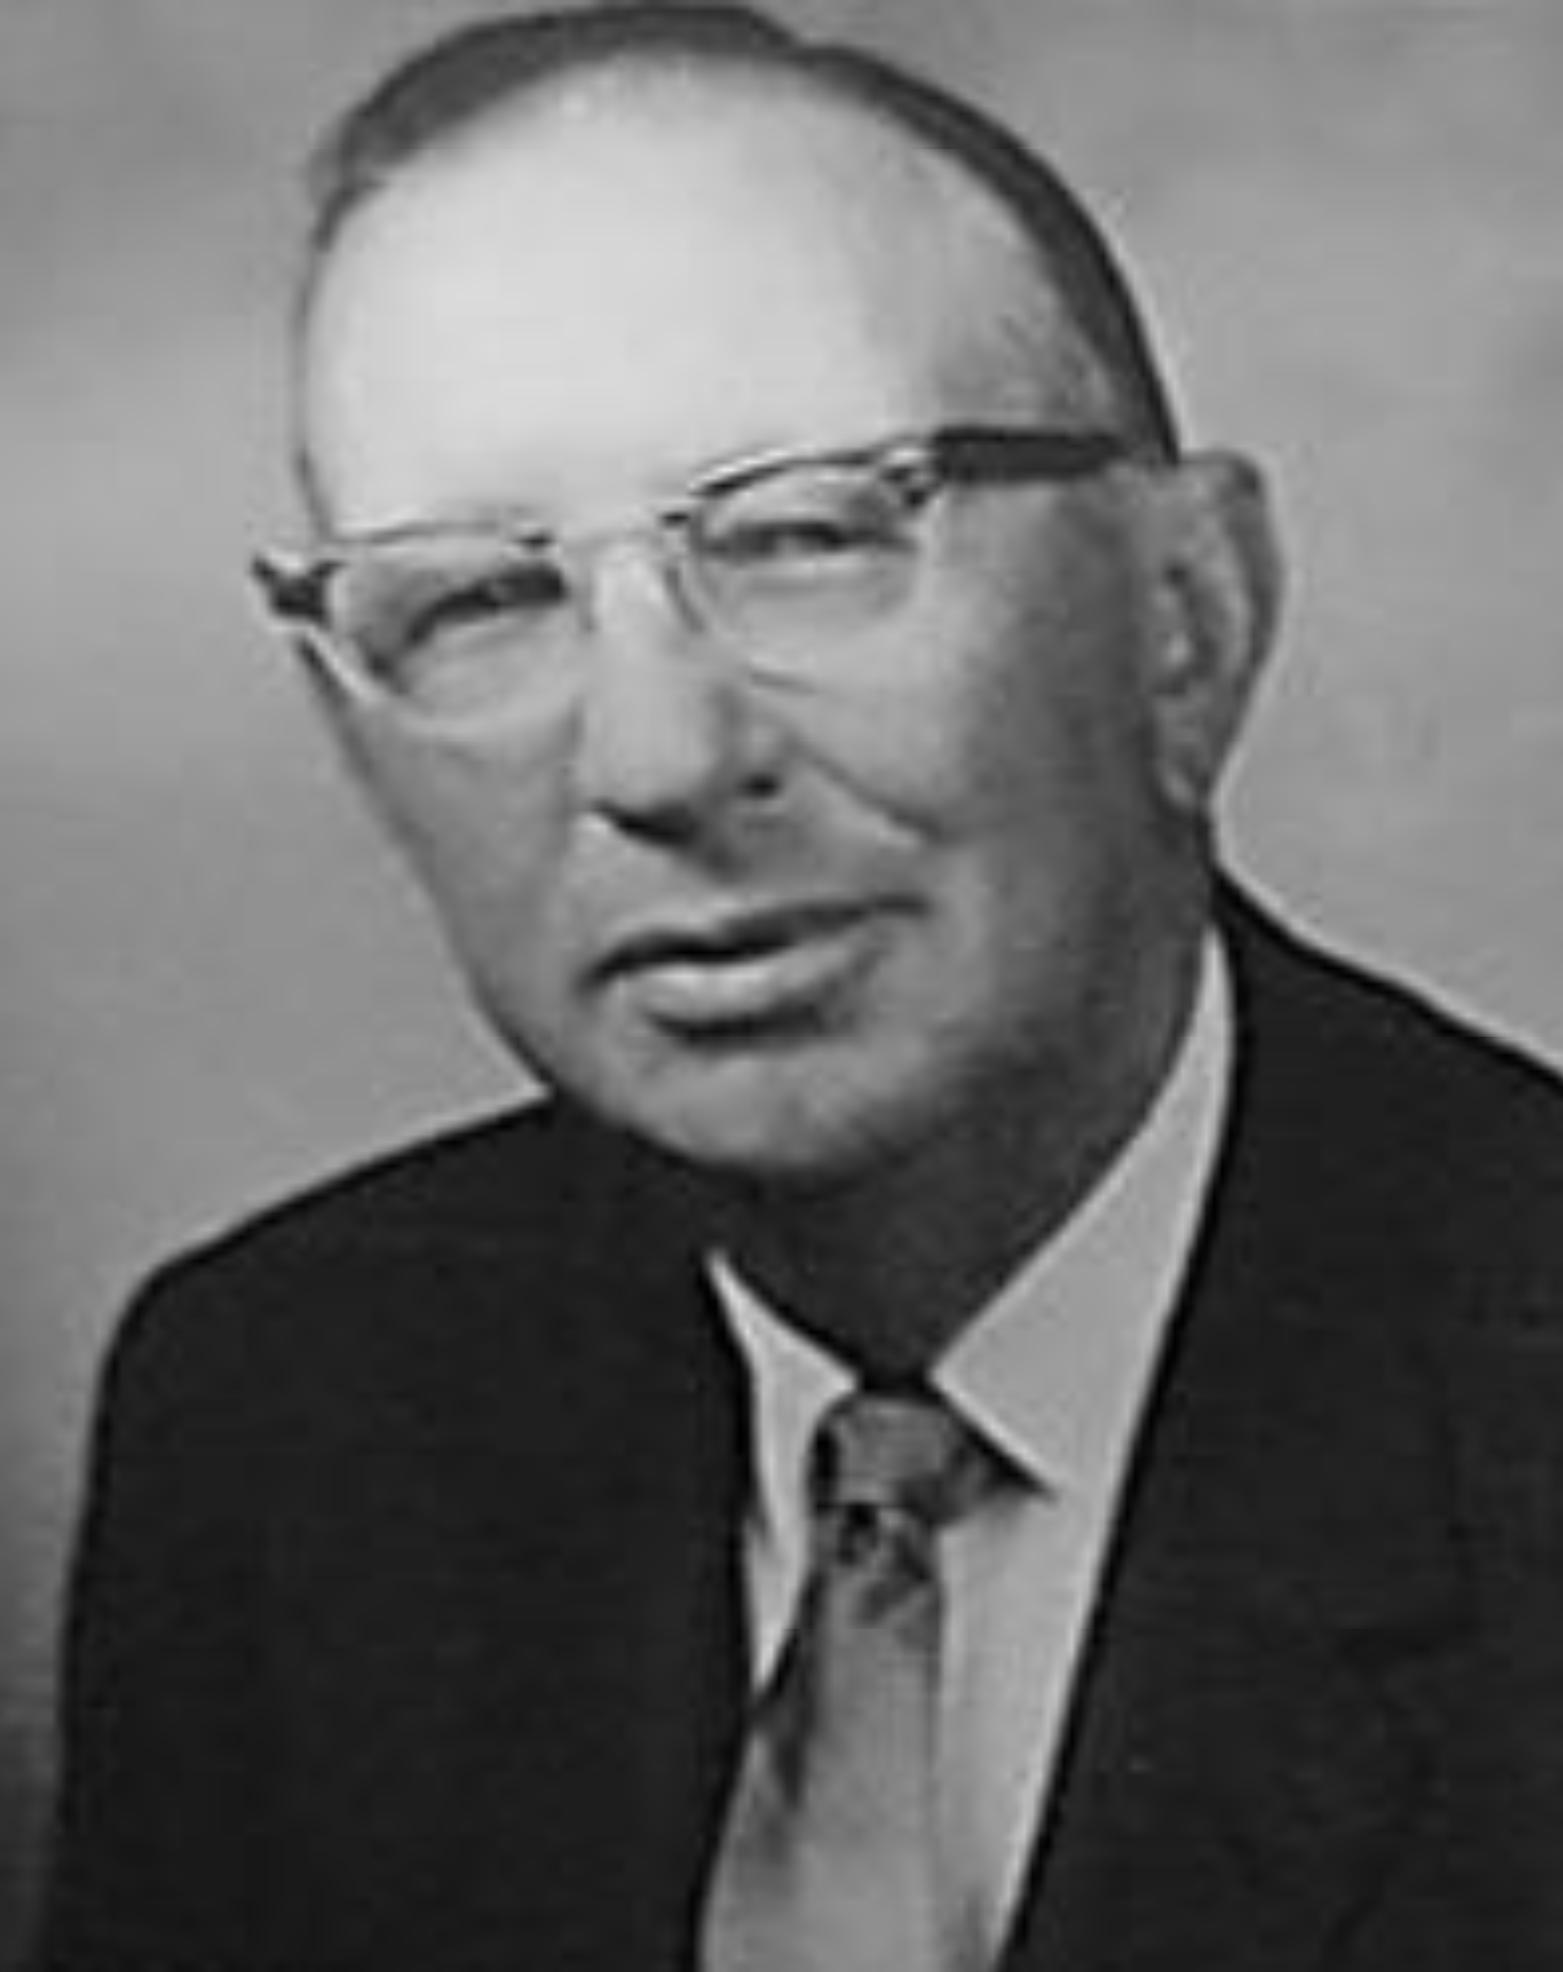 J. ED MORRIS